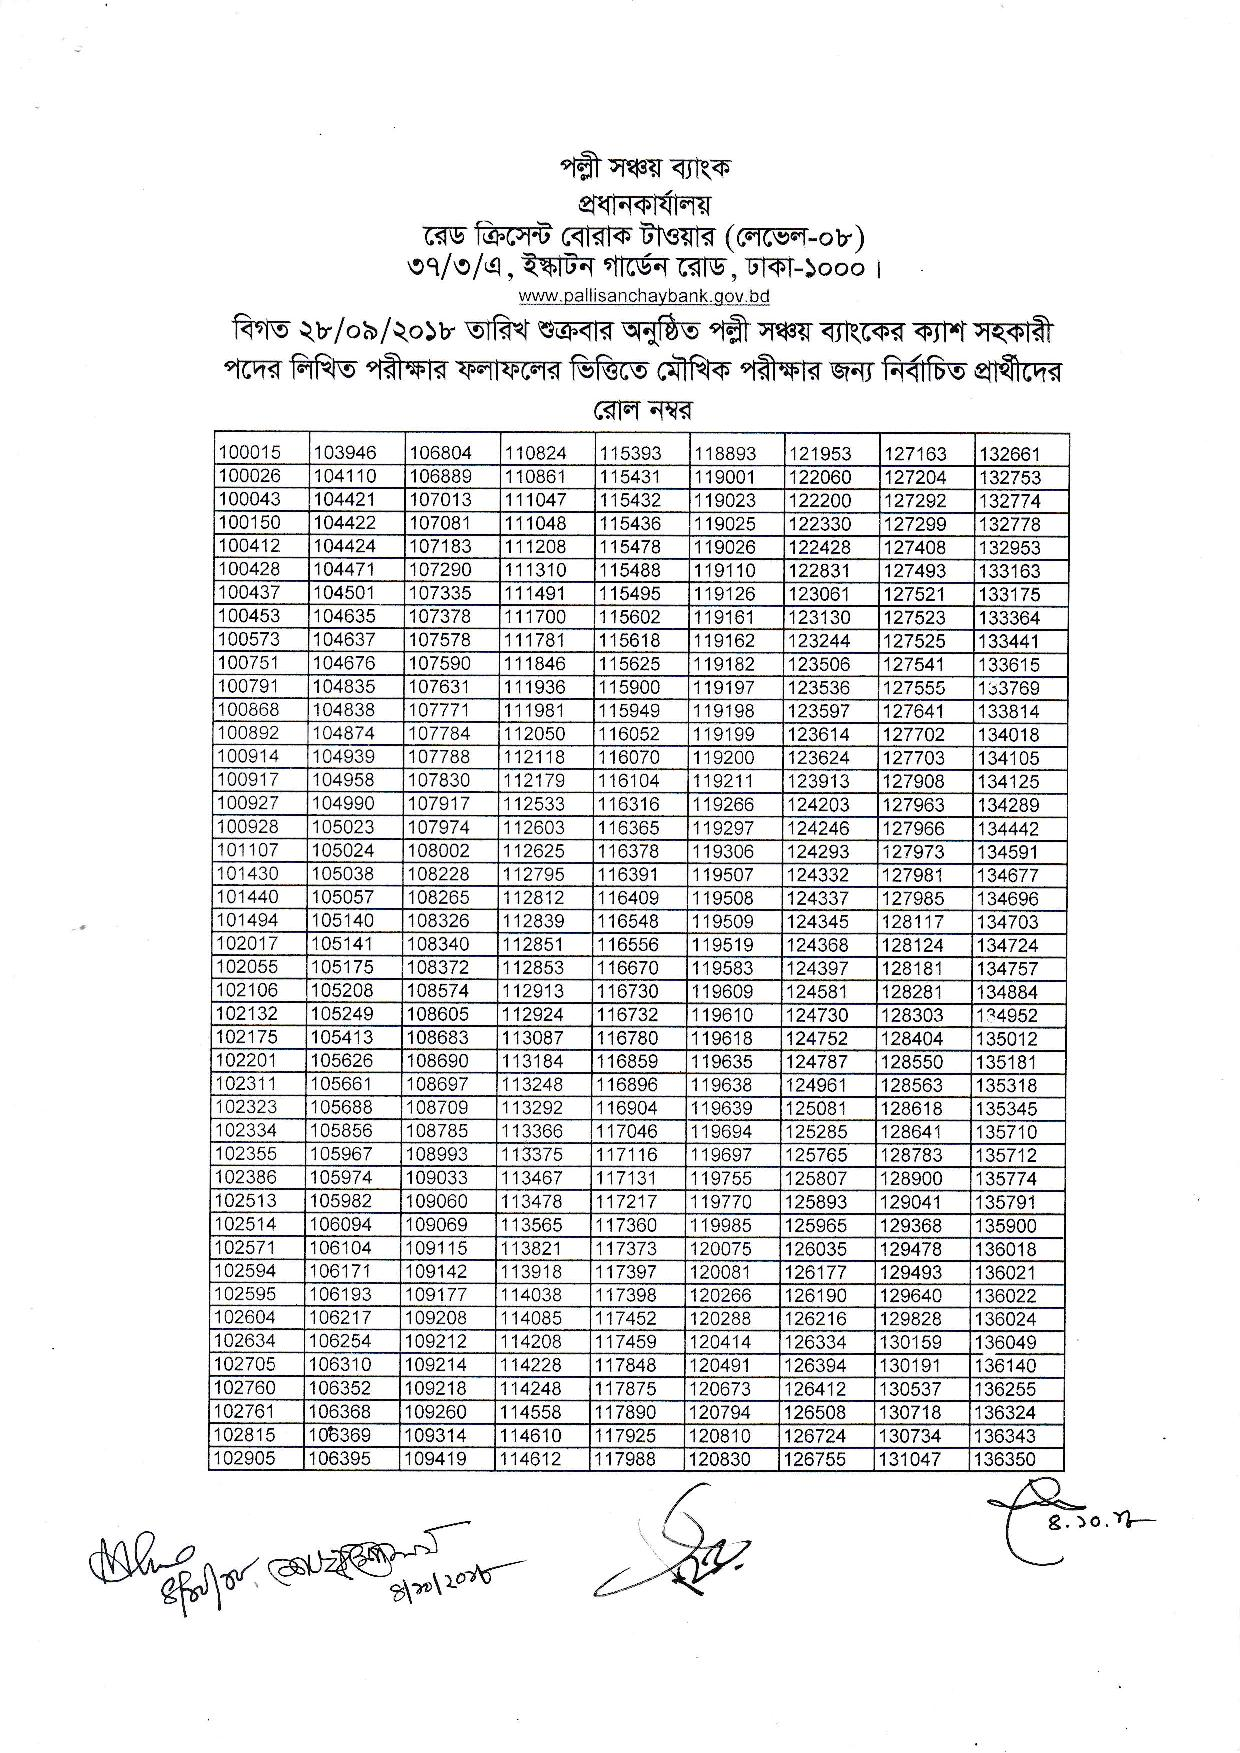 Palli Sanchay Bank PSB Exam Result